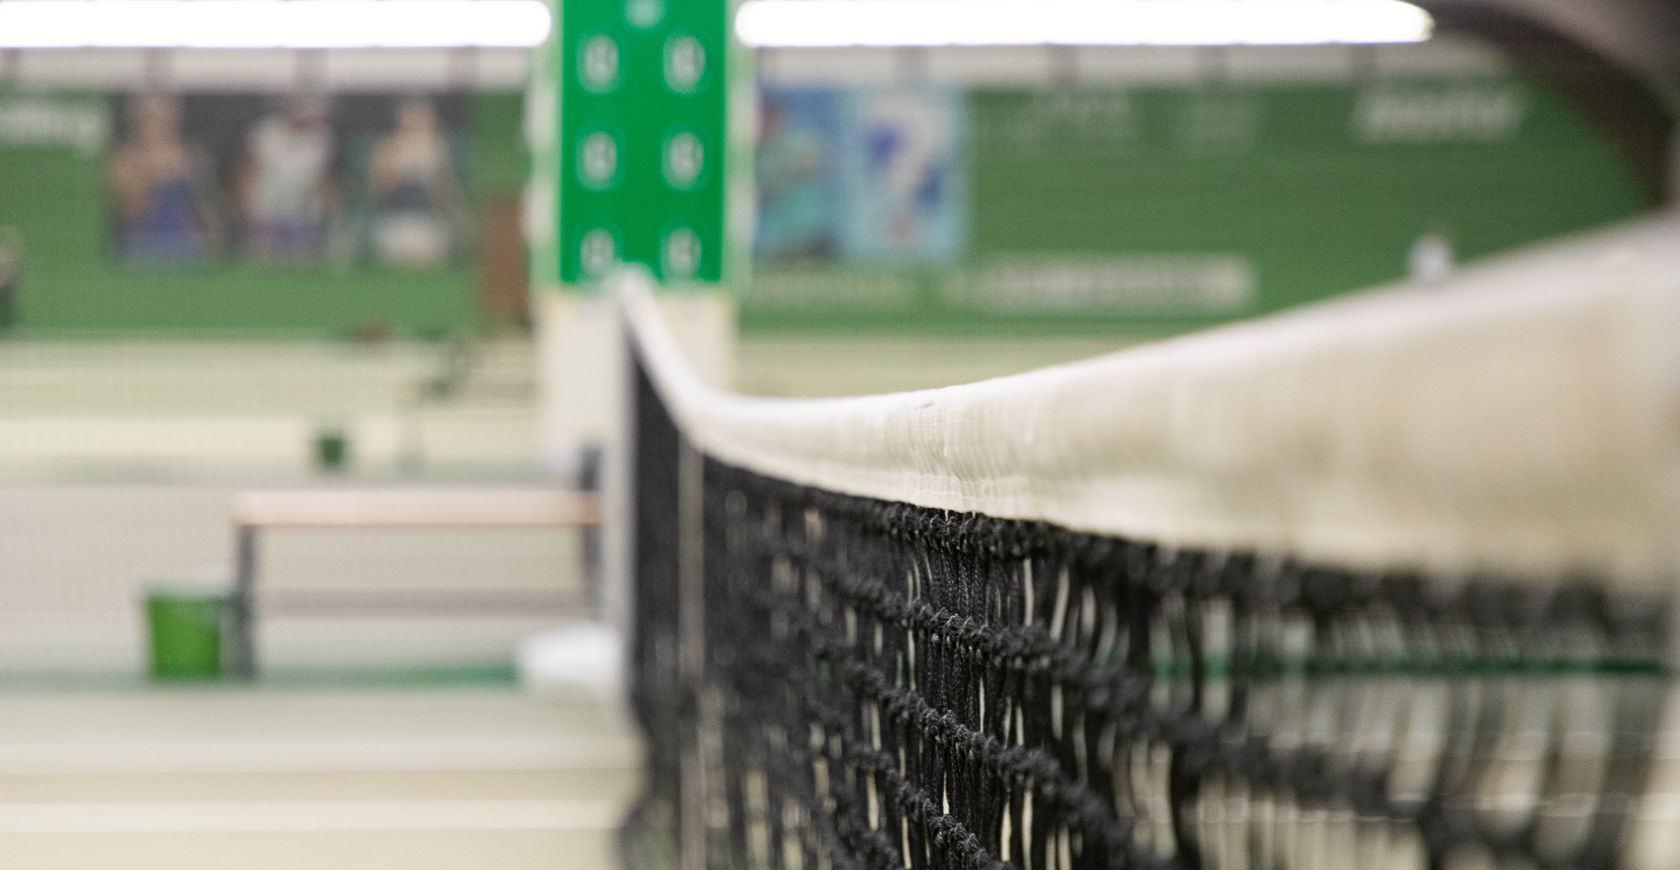 Kiel Tennis Kurs lernen Tennis